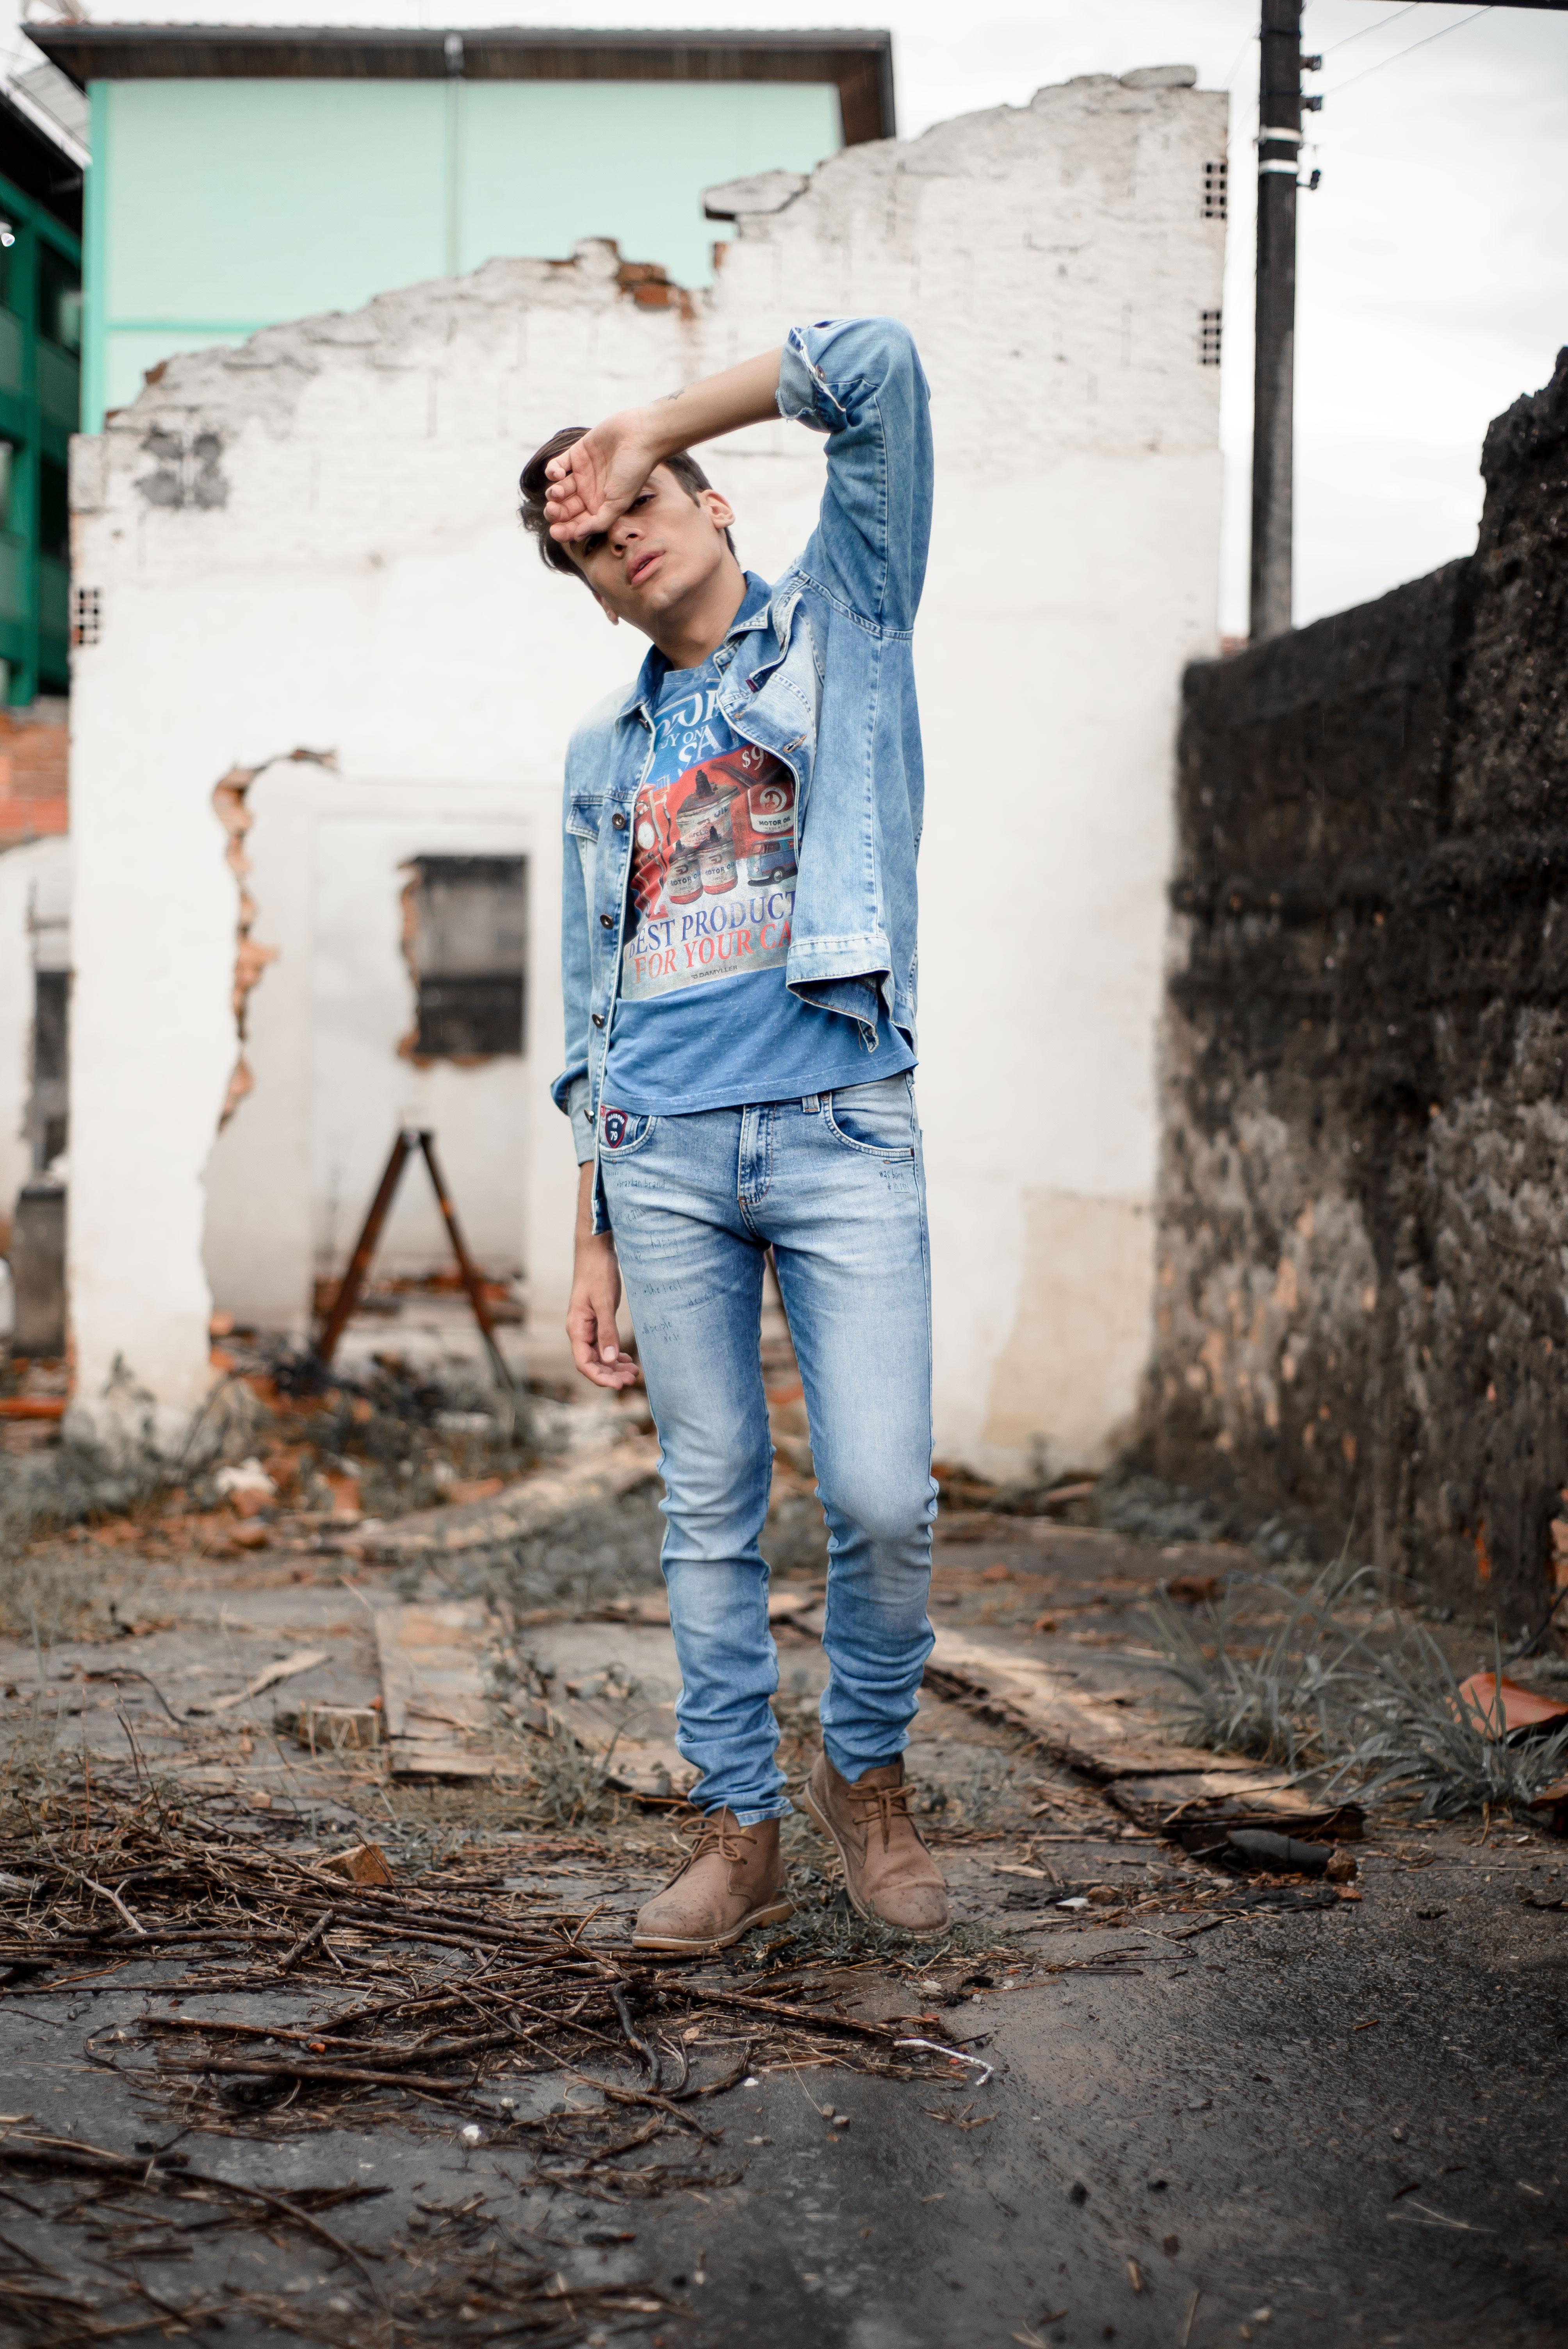 alex cursino, blogueiro de moda, blog de moda masculina, digital influencer, canal de moda, jaqueta jeans, calça jeans, damyller, mens, menswear, style, (10)